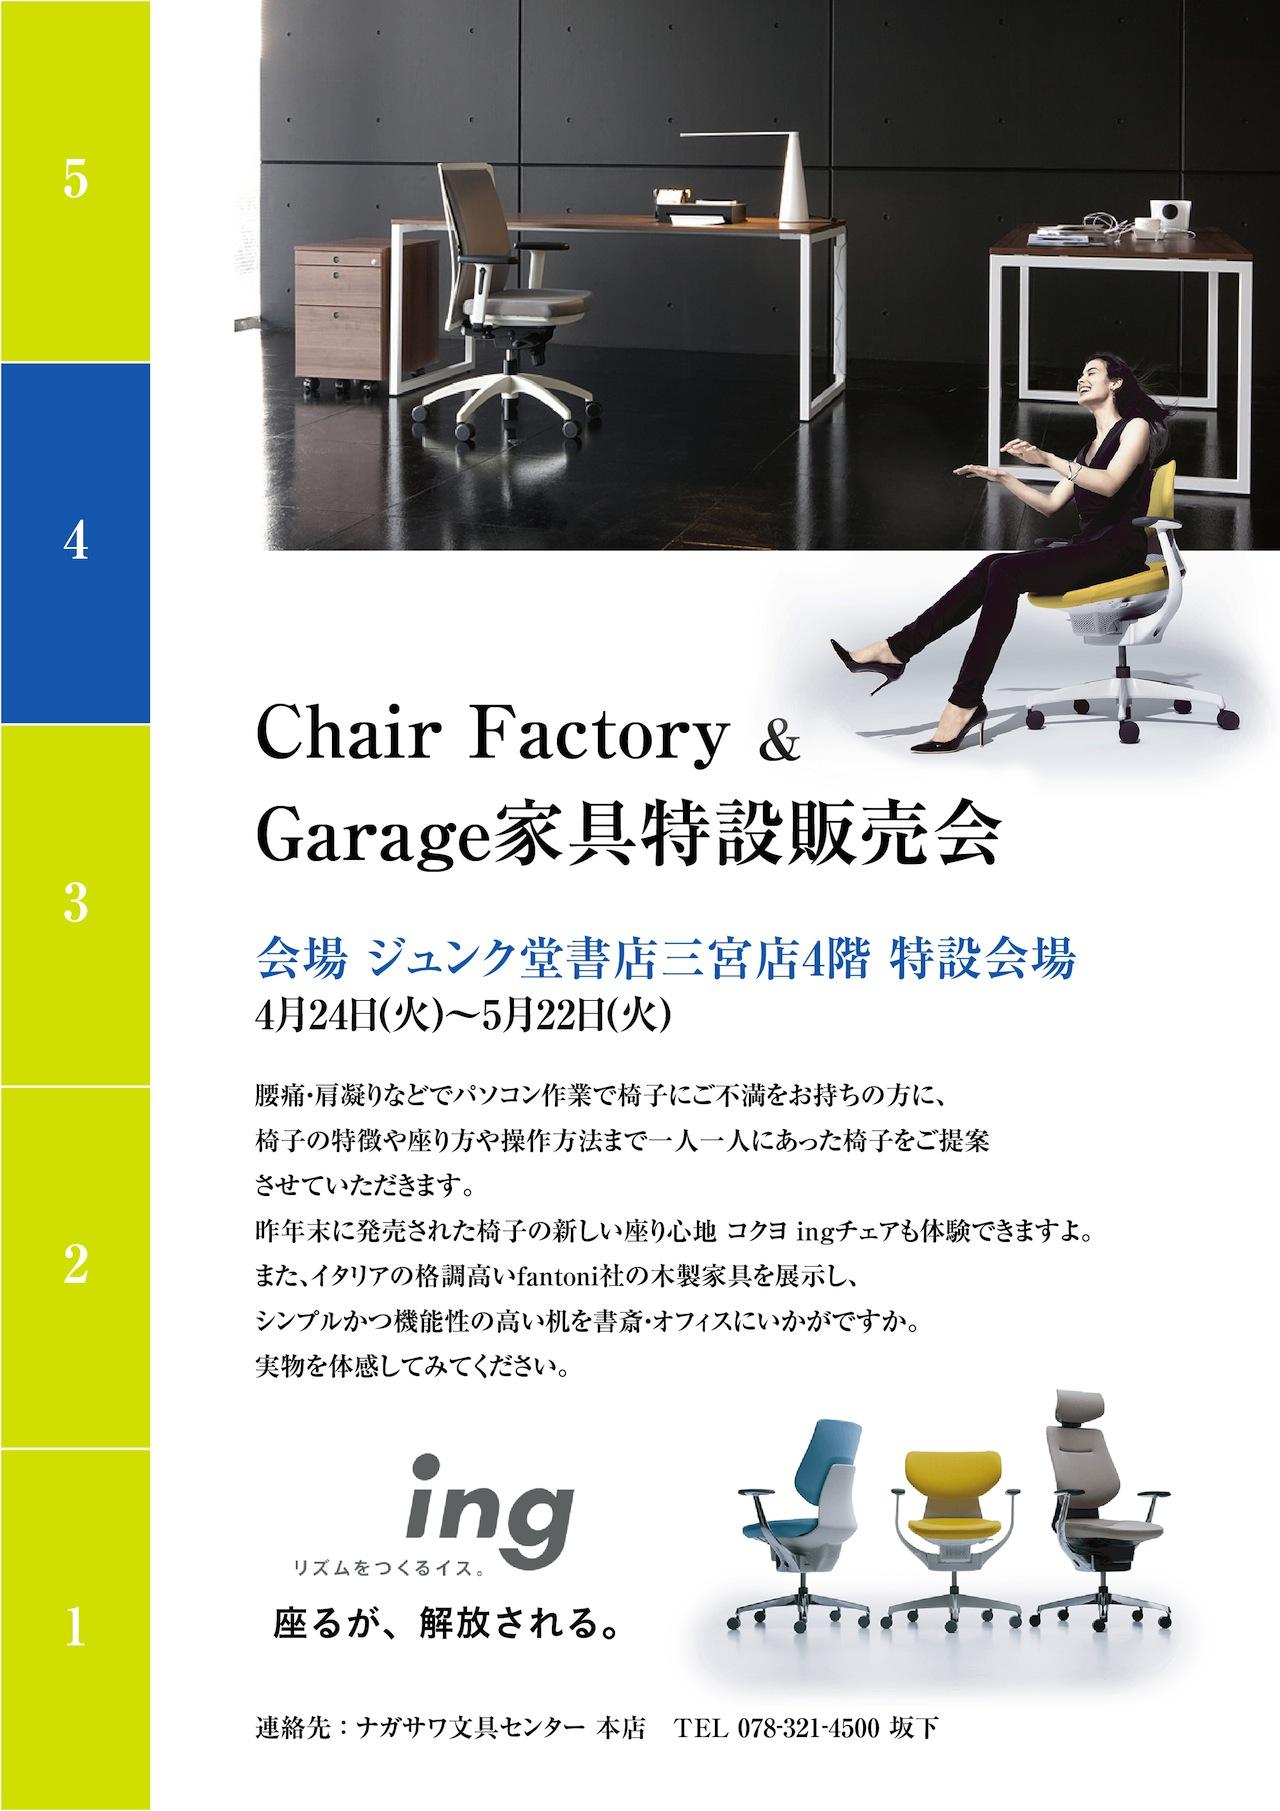 Chair Factory Garage家具特設販売会! | ナガサワ文具センター本店